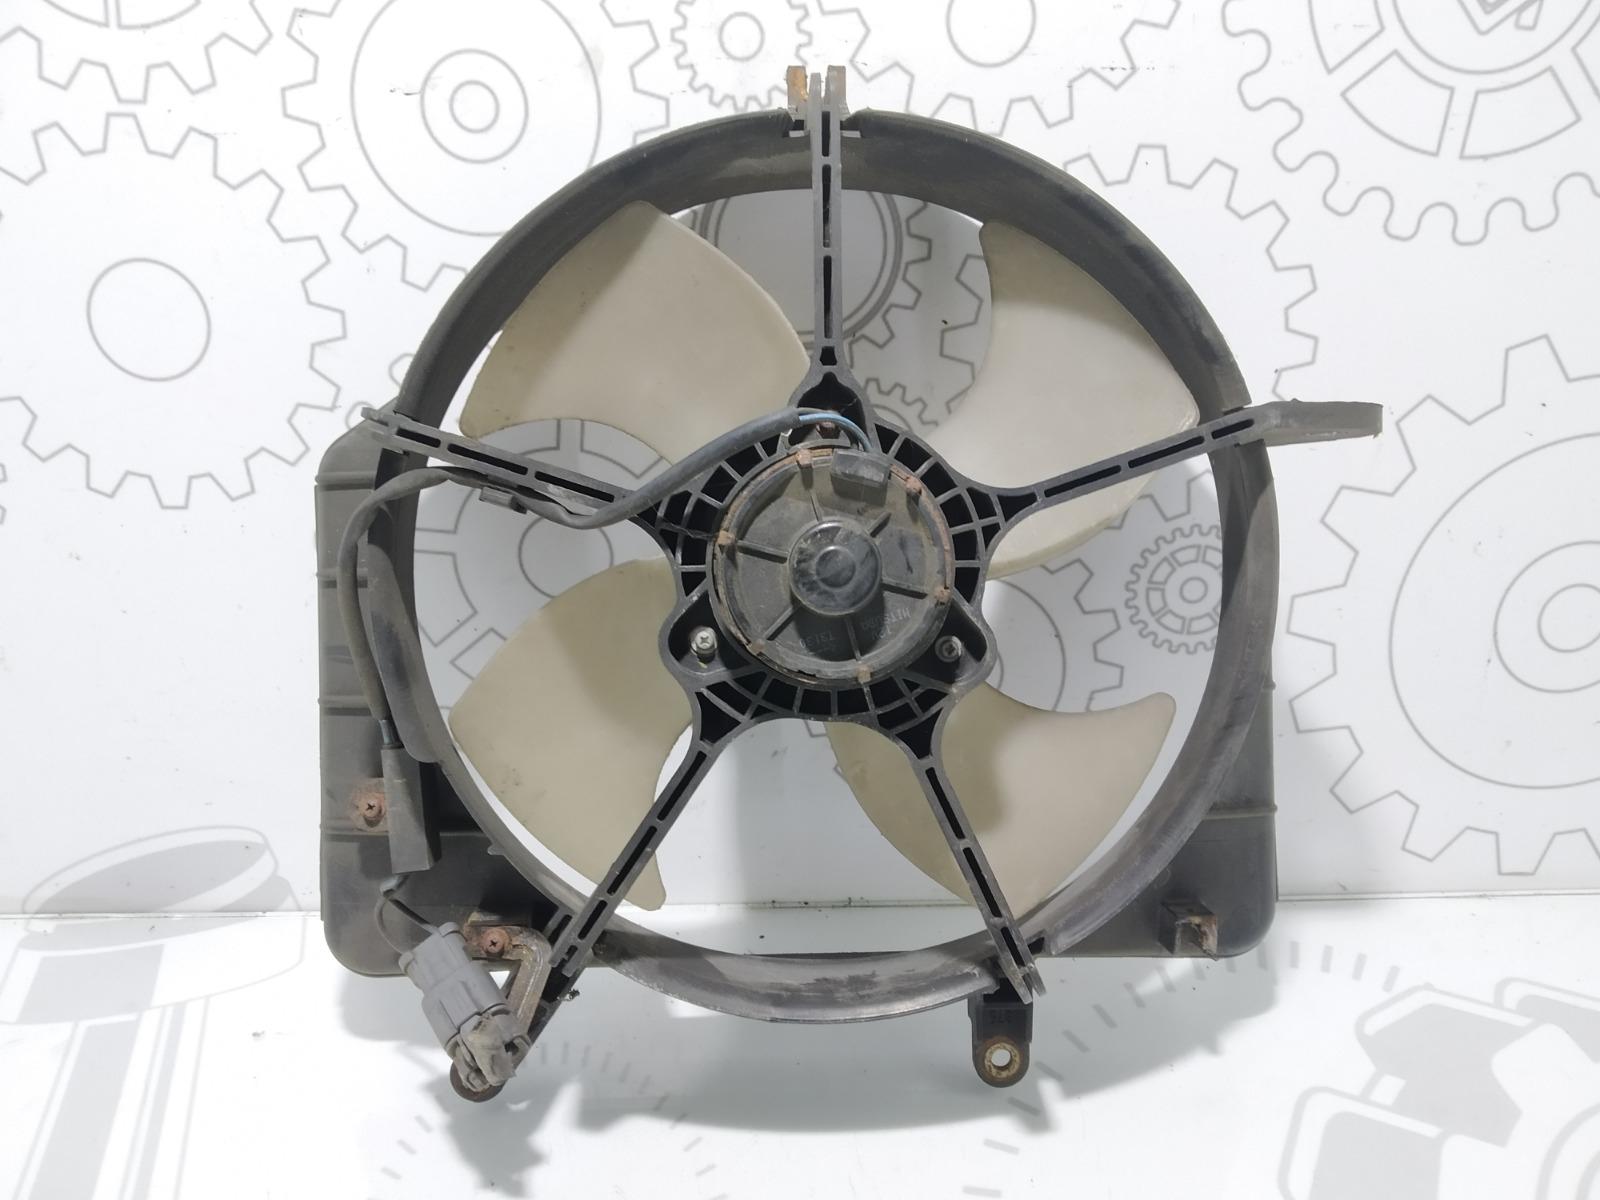 Вентилятор радиатора Honda Jazz 1.3 I 2003 (б/у)